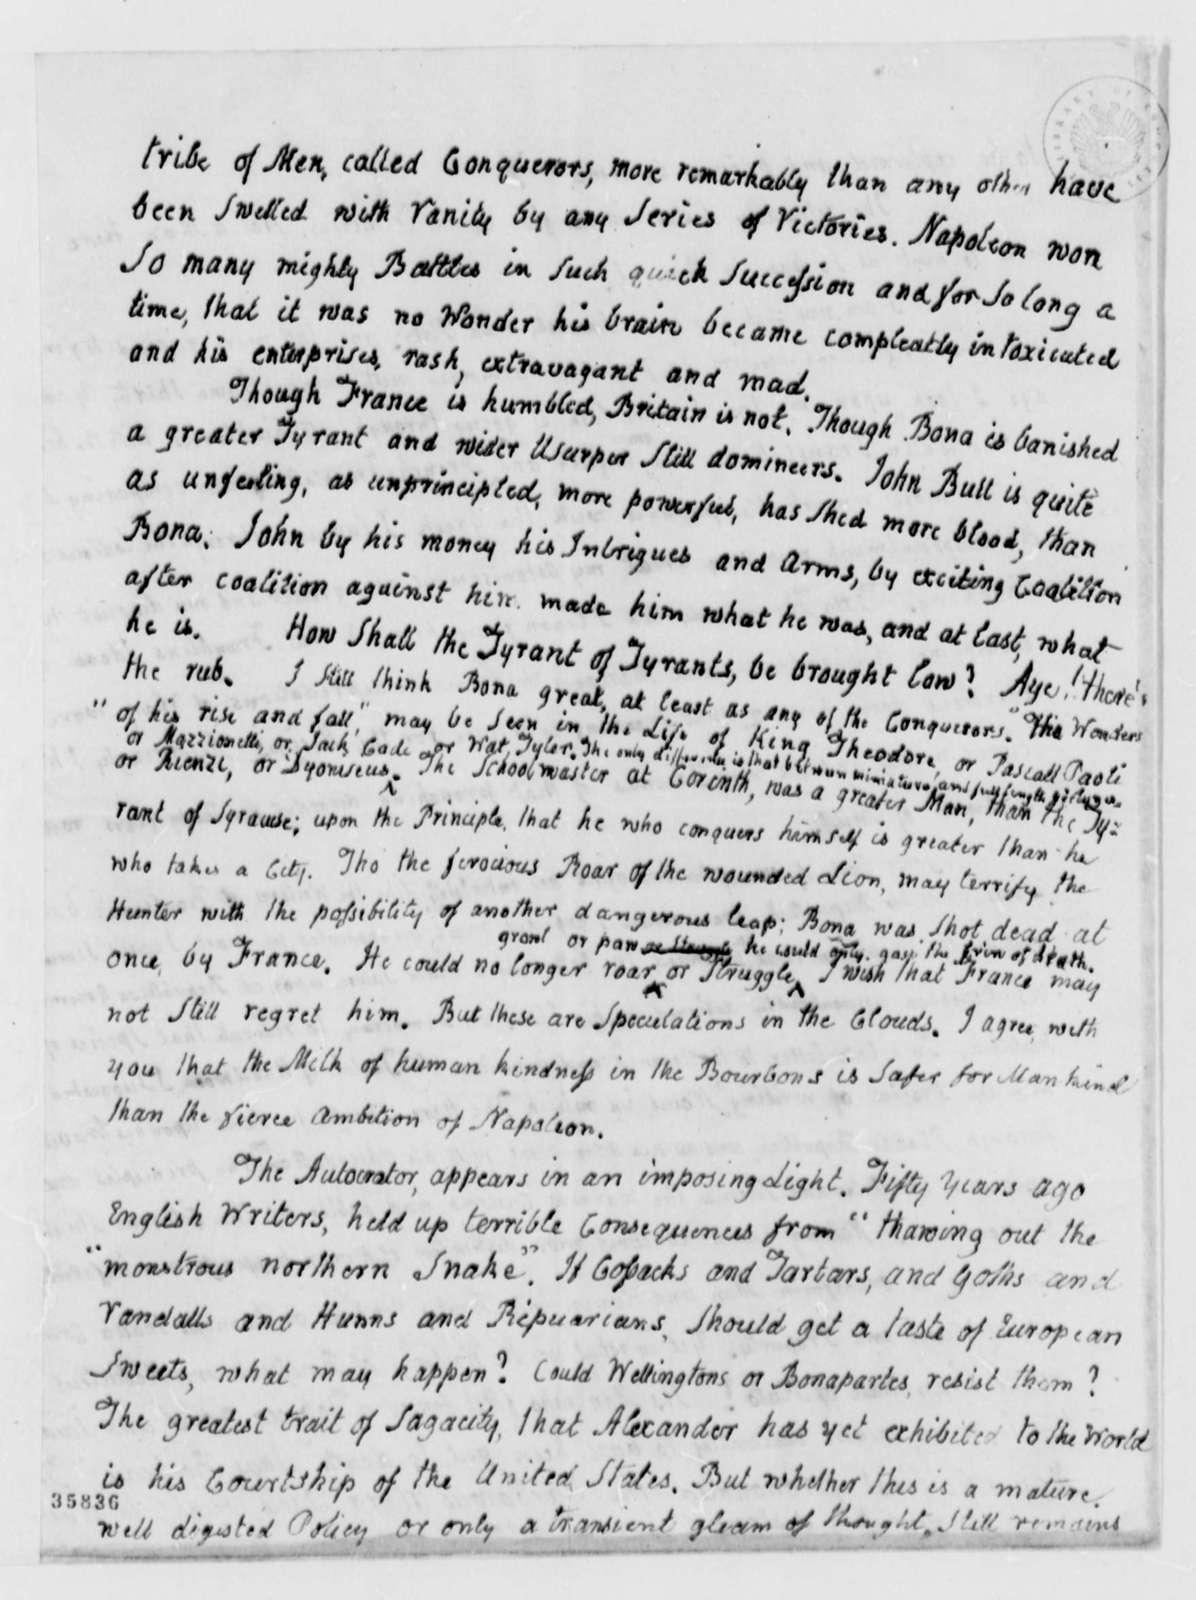 John Adams to Thomas Jefferson, July 16, 1814